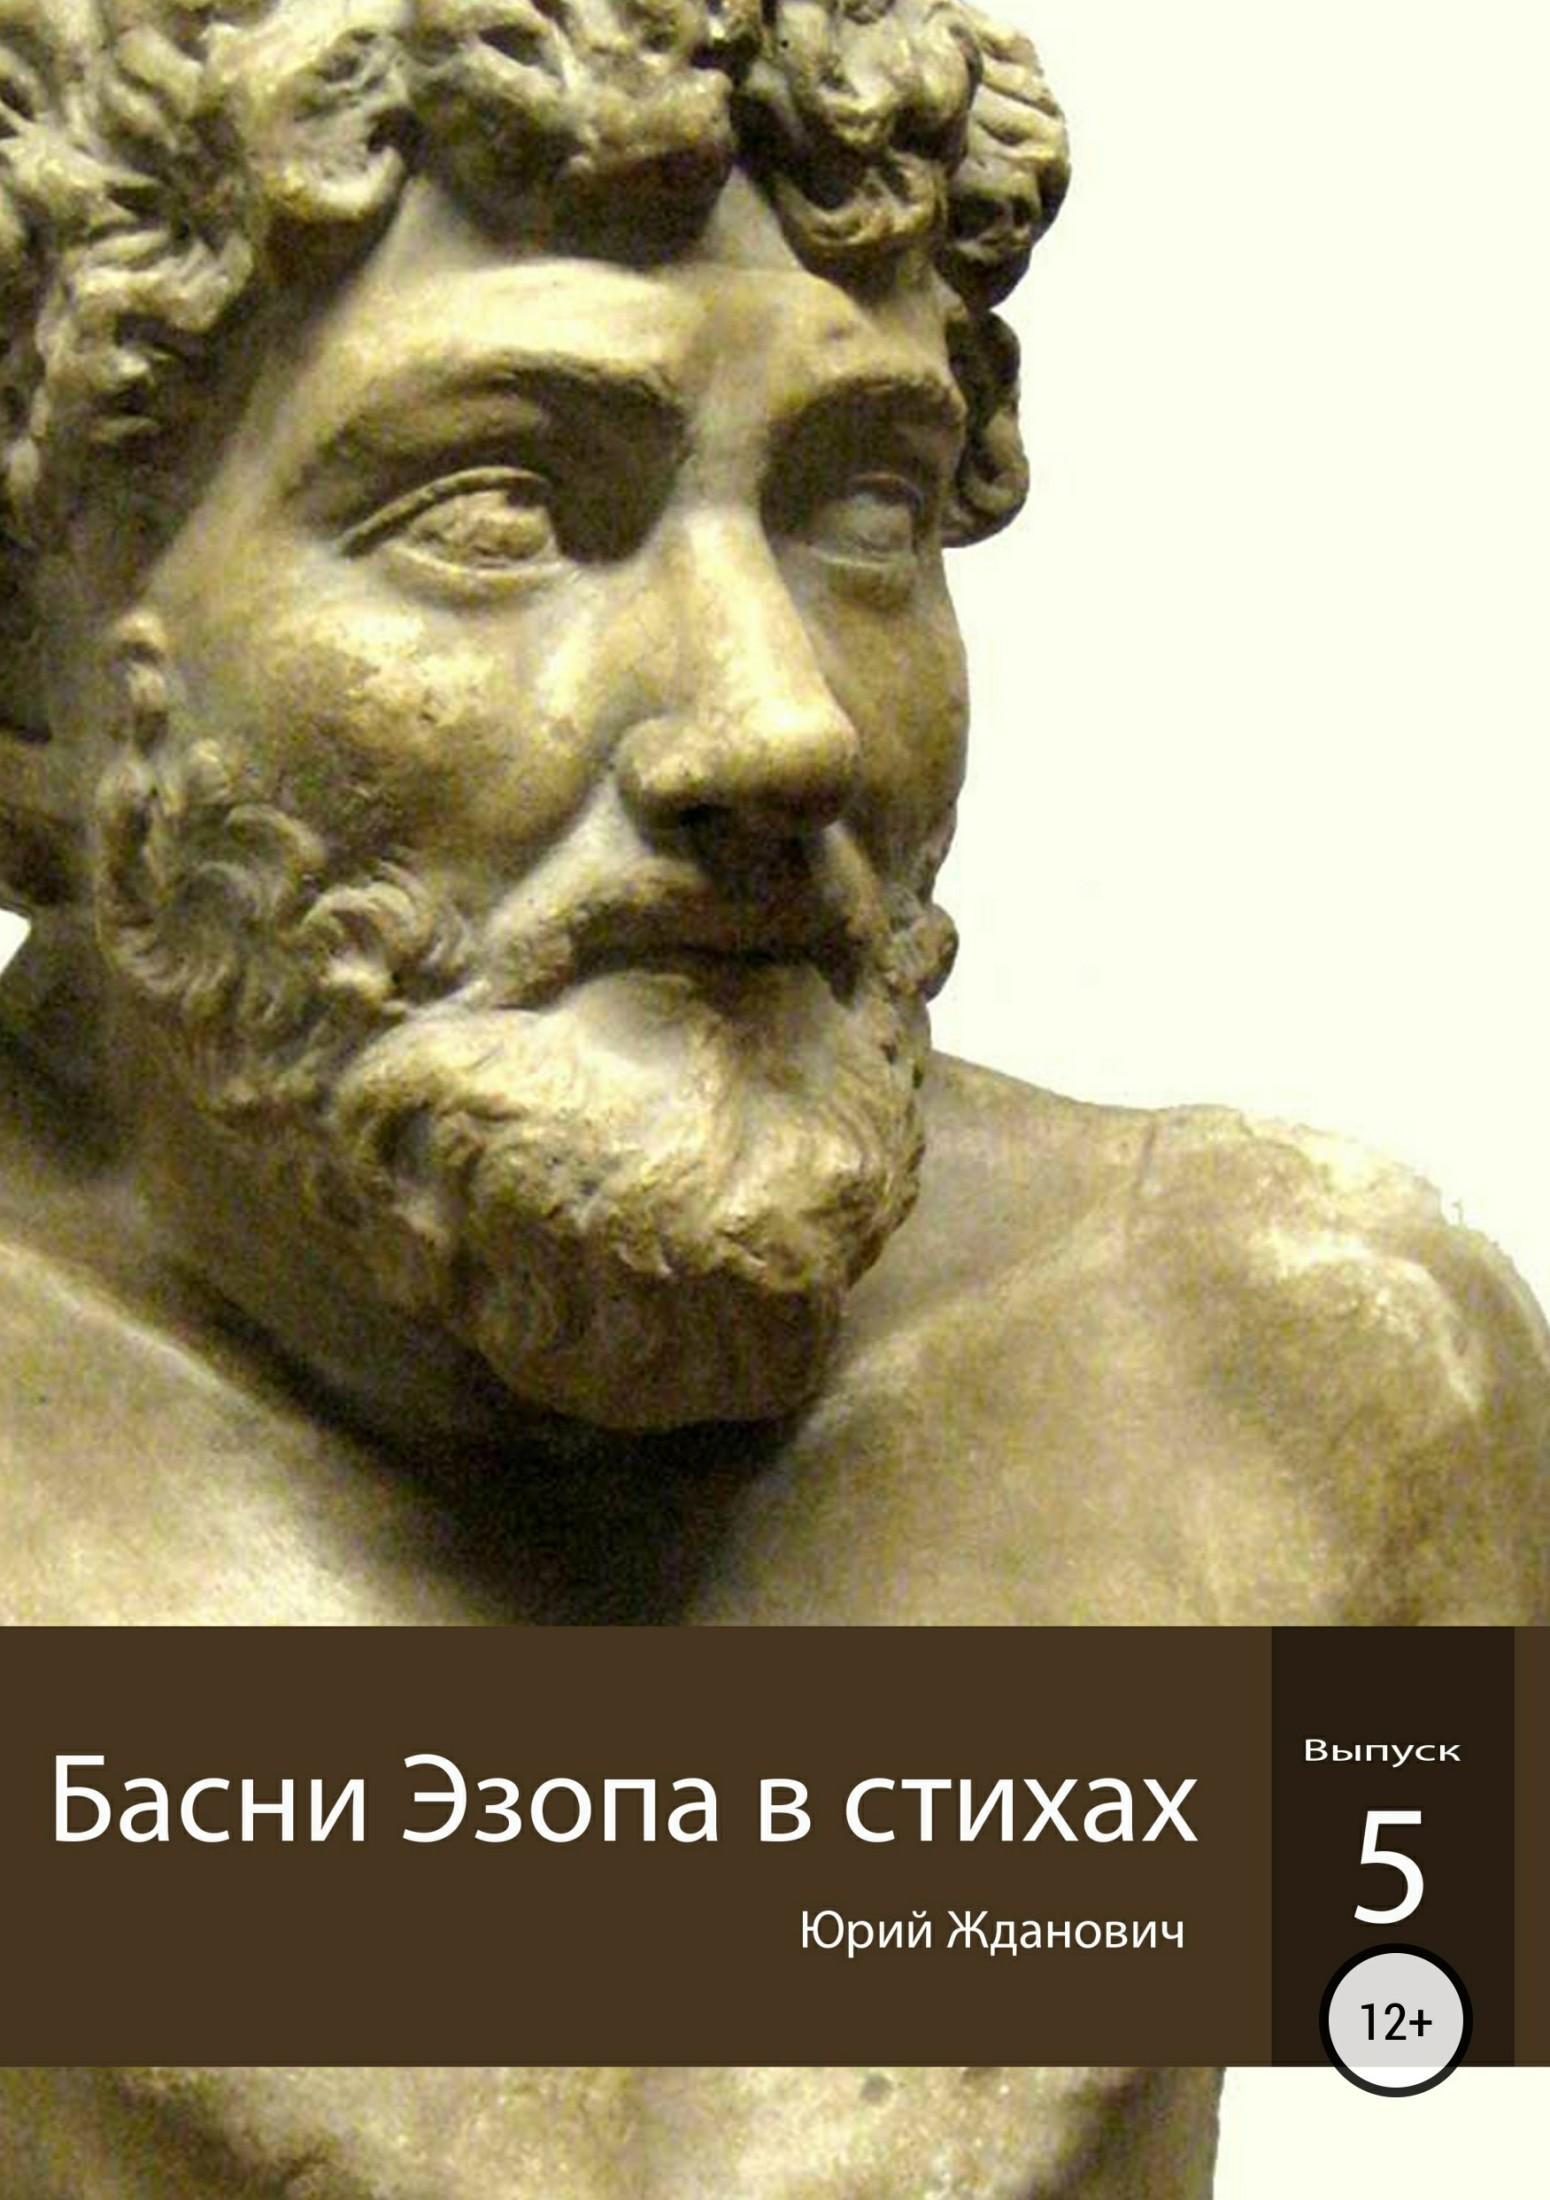 Юрий Михайлович Жданович Басни Эзопа в стихах. Выпуск 5 мастер класс басни с моралью